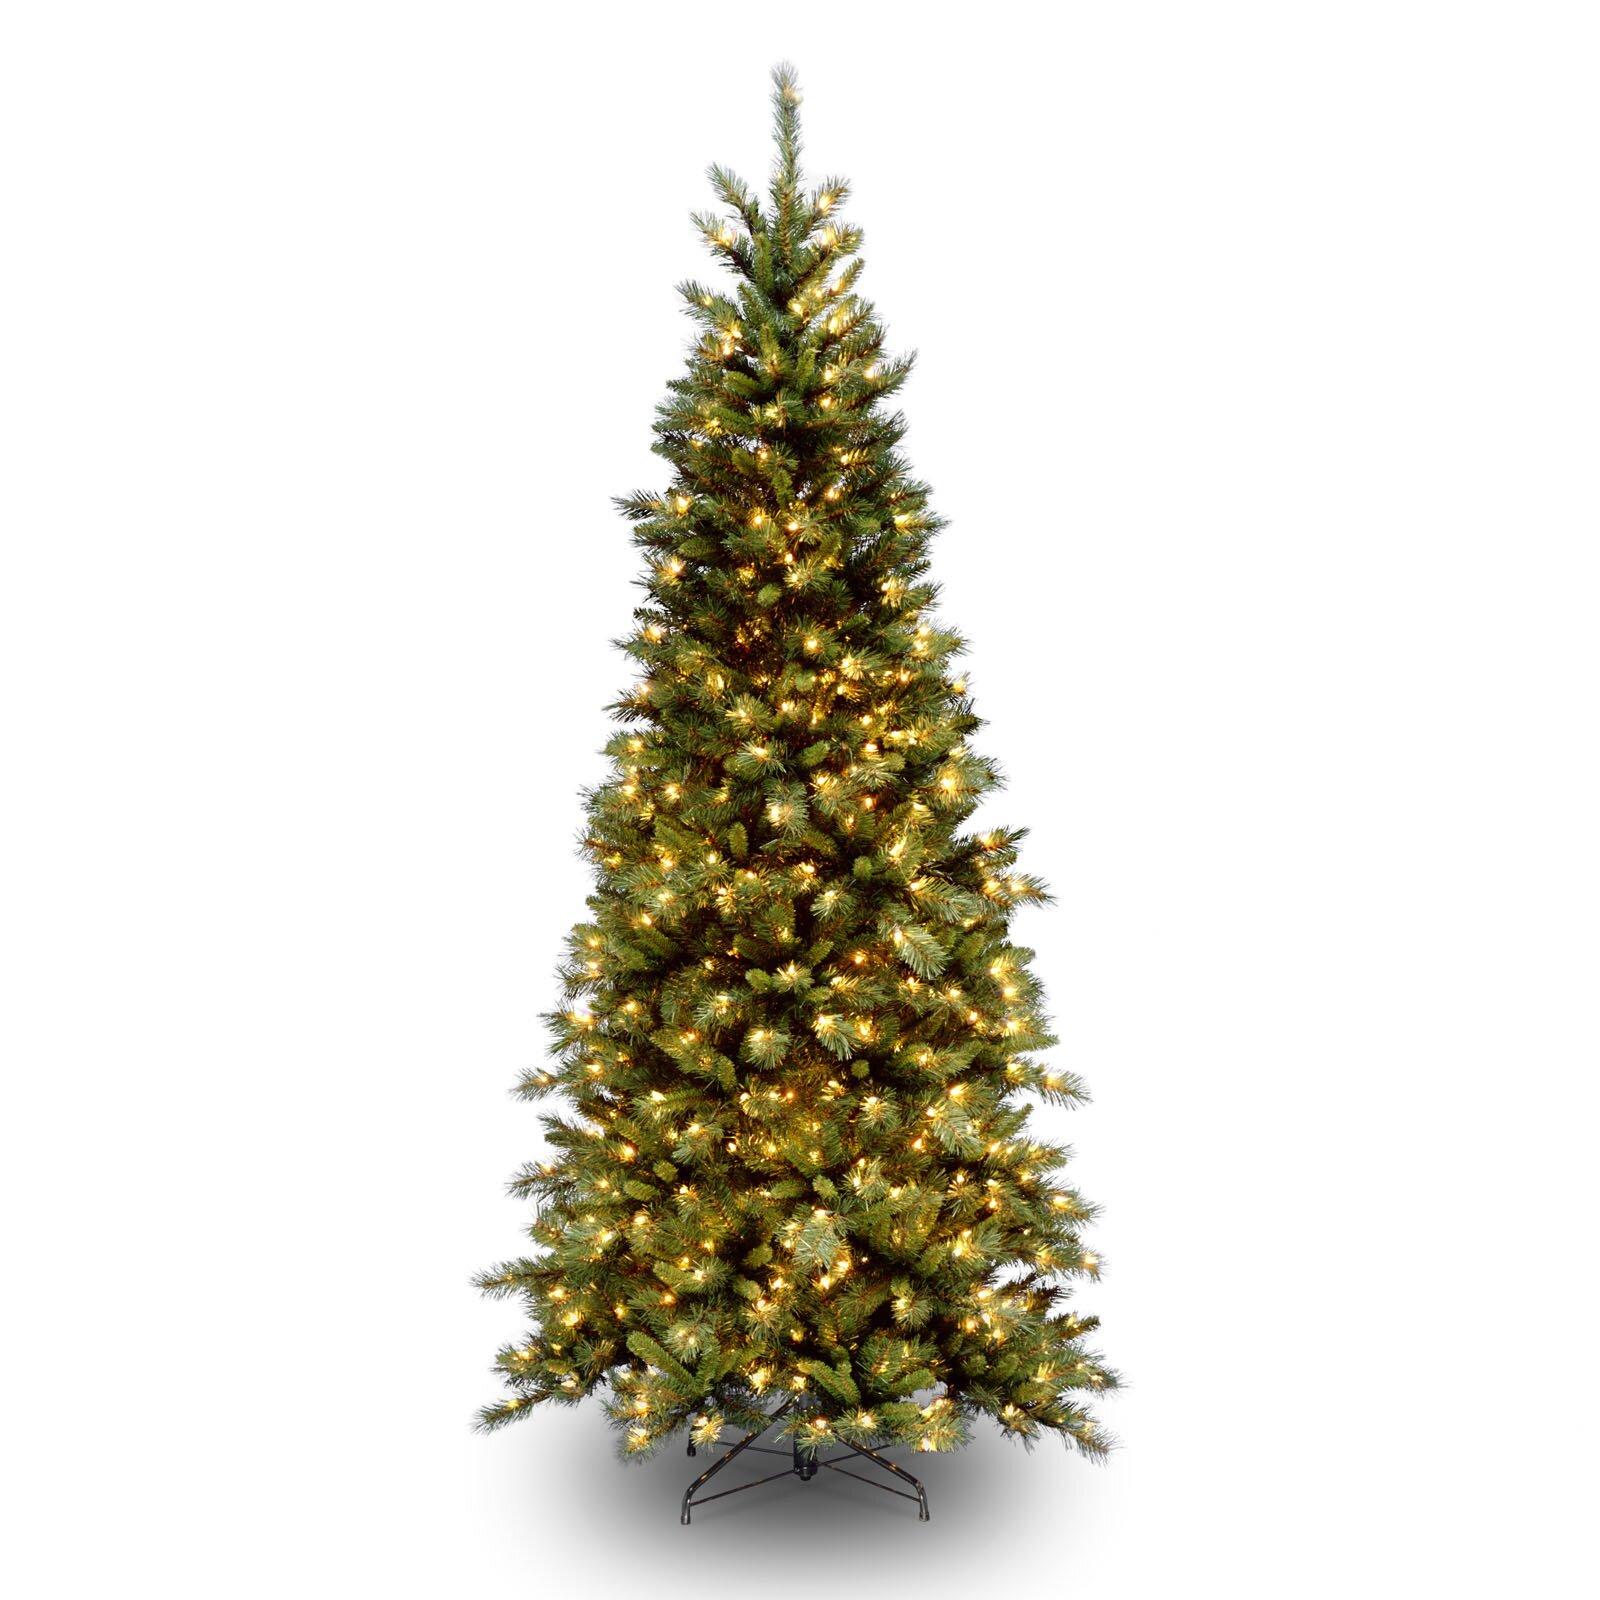 Next Slim Christmas Tree: National Tree Co. Tiffany Fir 7.5' Green Slim Artificial